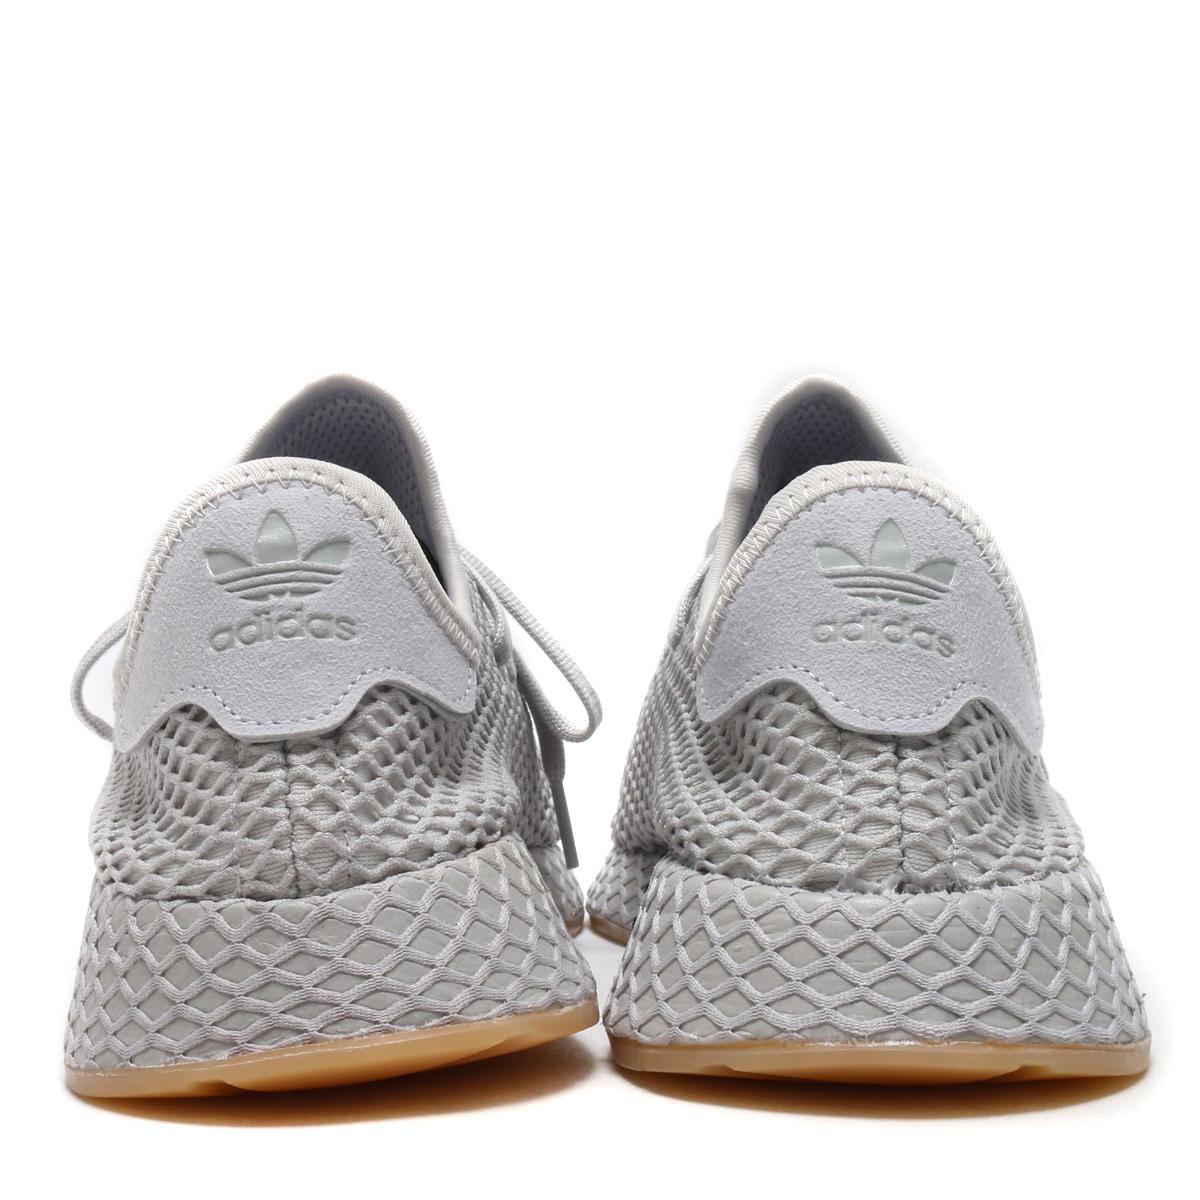 f6aeae7d716e5 adidas Originals DEERUPT RUNNER (アディダスオリジナルスディーラプトランナー) (Grace Lee F17 LGH  solid gray   gum 1) 18SS-I